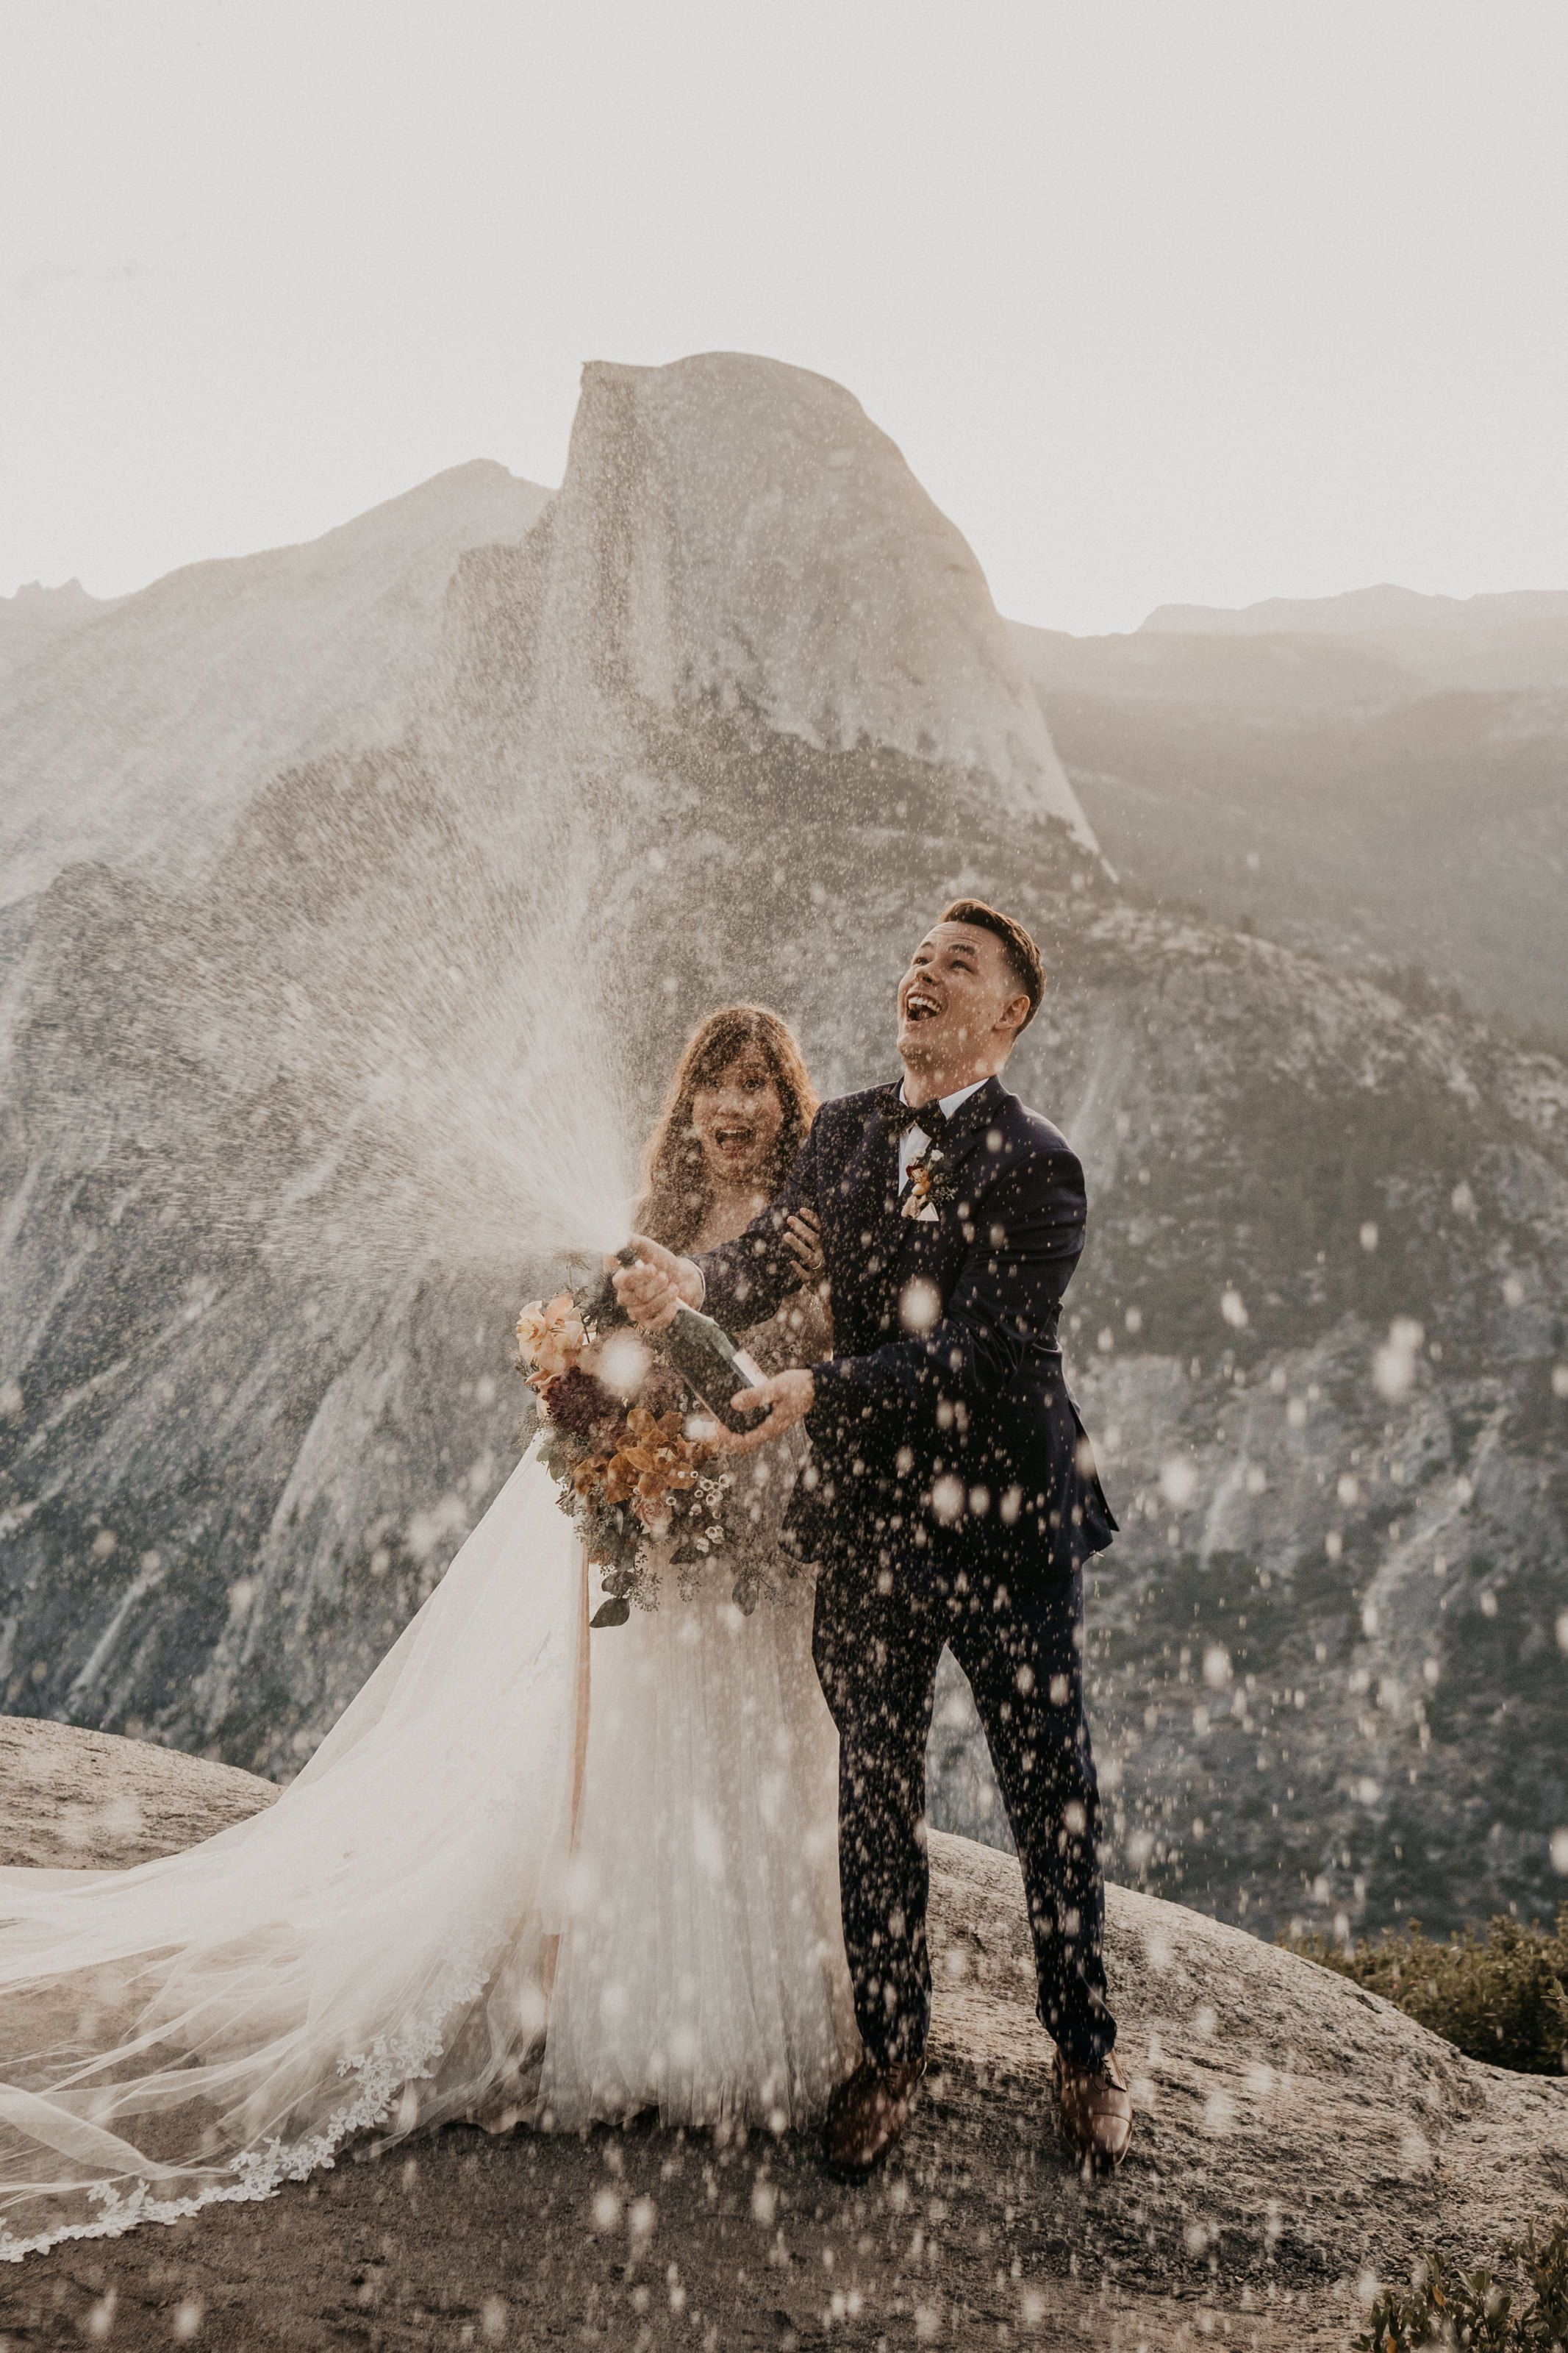 Romantic Yosemite Adventure Elopement Julie And Calvin Henry Tieu Photography In 2020 Yosemite Elopement Yosemite Wedding Elope Wedding